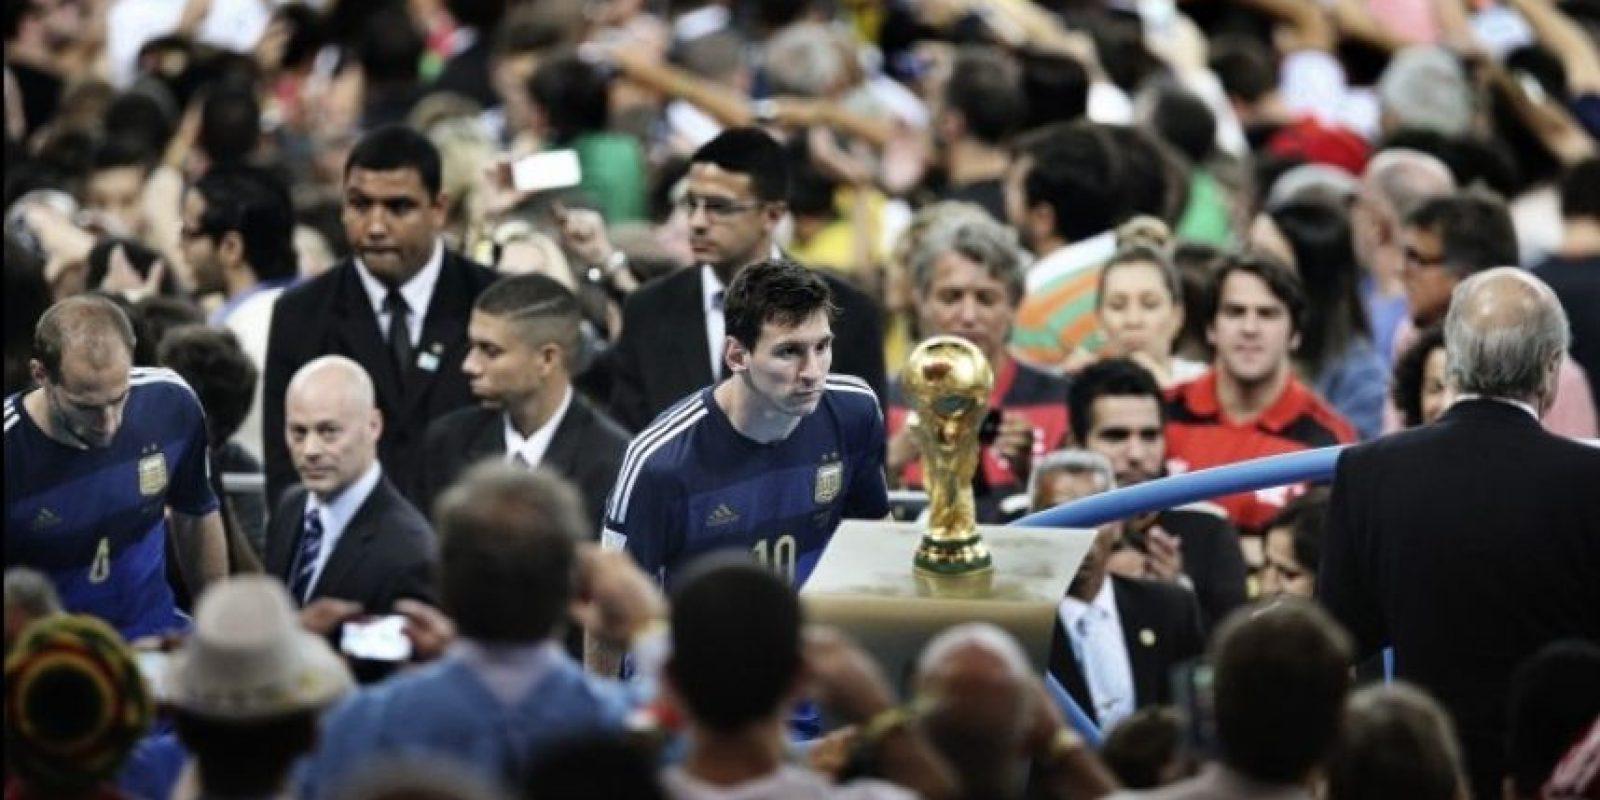 "Primer lugar ""Deportes"": Bao Tailiang, de China, muestra el momento en que Lionel Messi observa la Copa del Mundo. Argentina perdió la final en contra de Alemania 1-0 Foto:World Press Photo 2015"